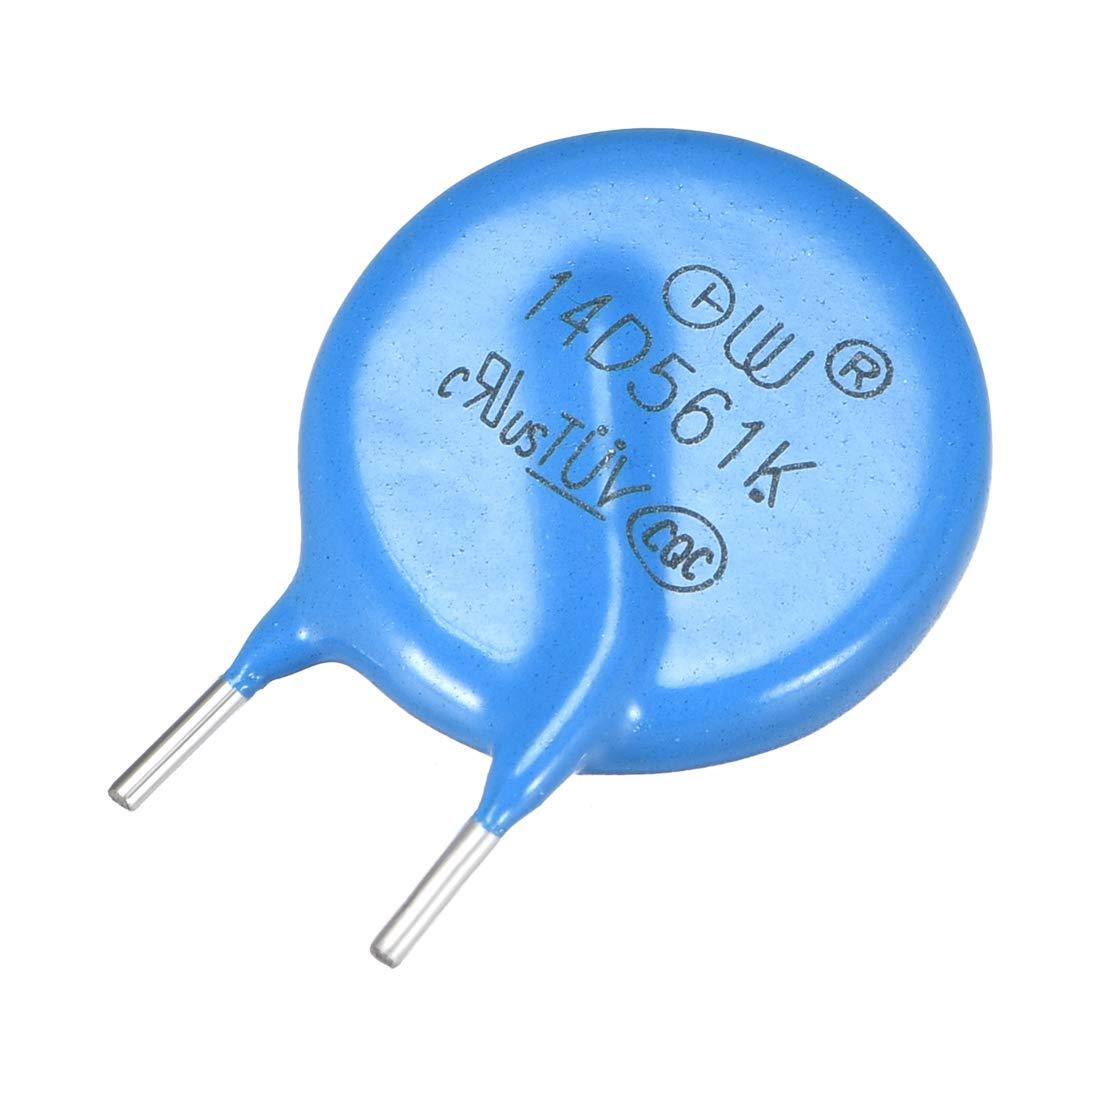 uxcell 20Pcs Voltage Dependent Resistors AC 175V 14D271K Radial Lead Disc Varistors